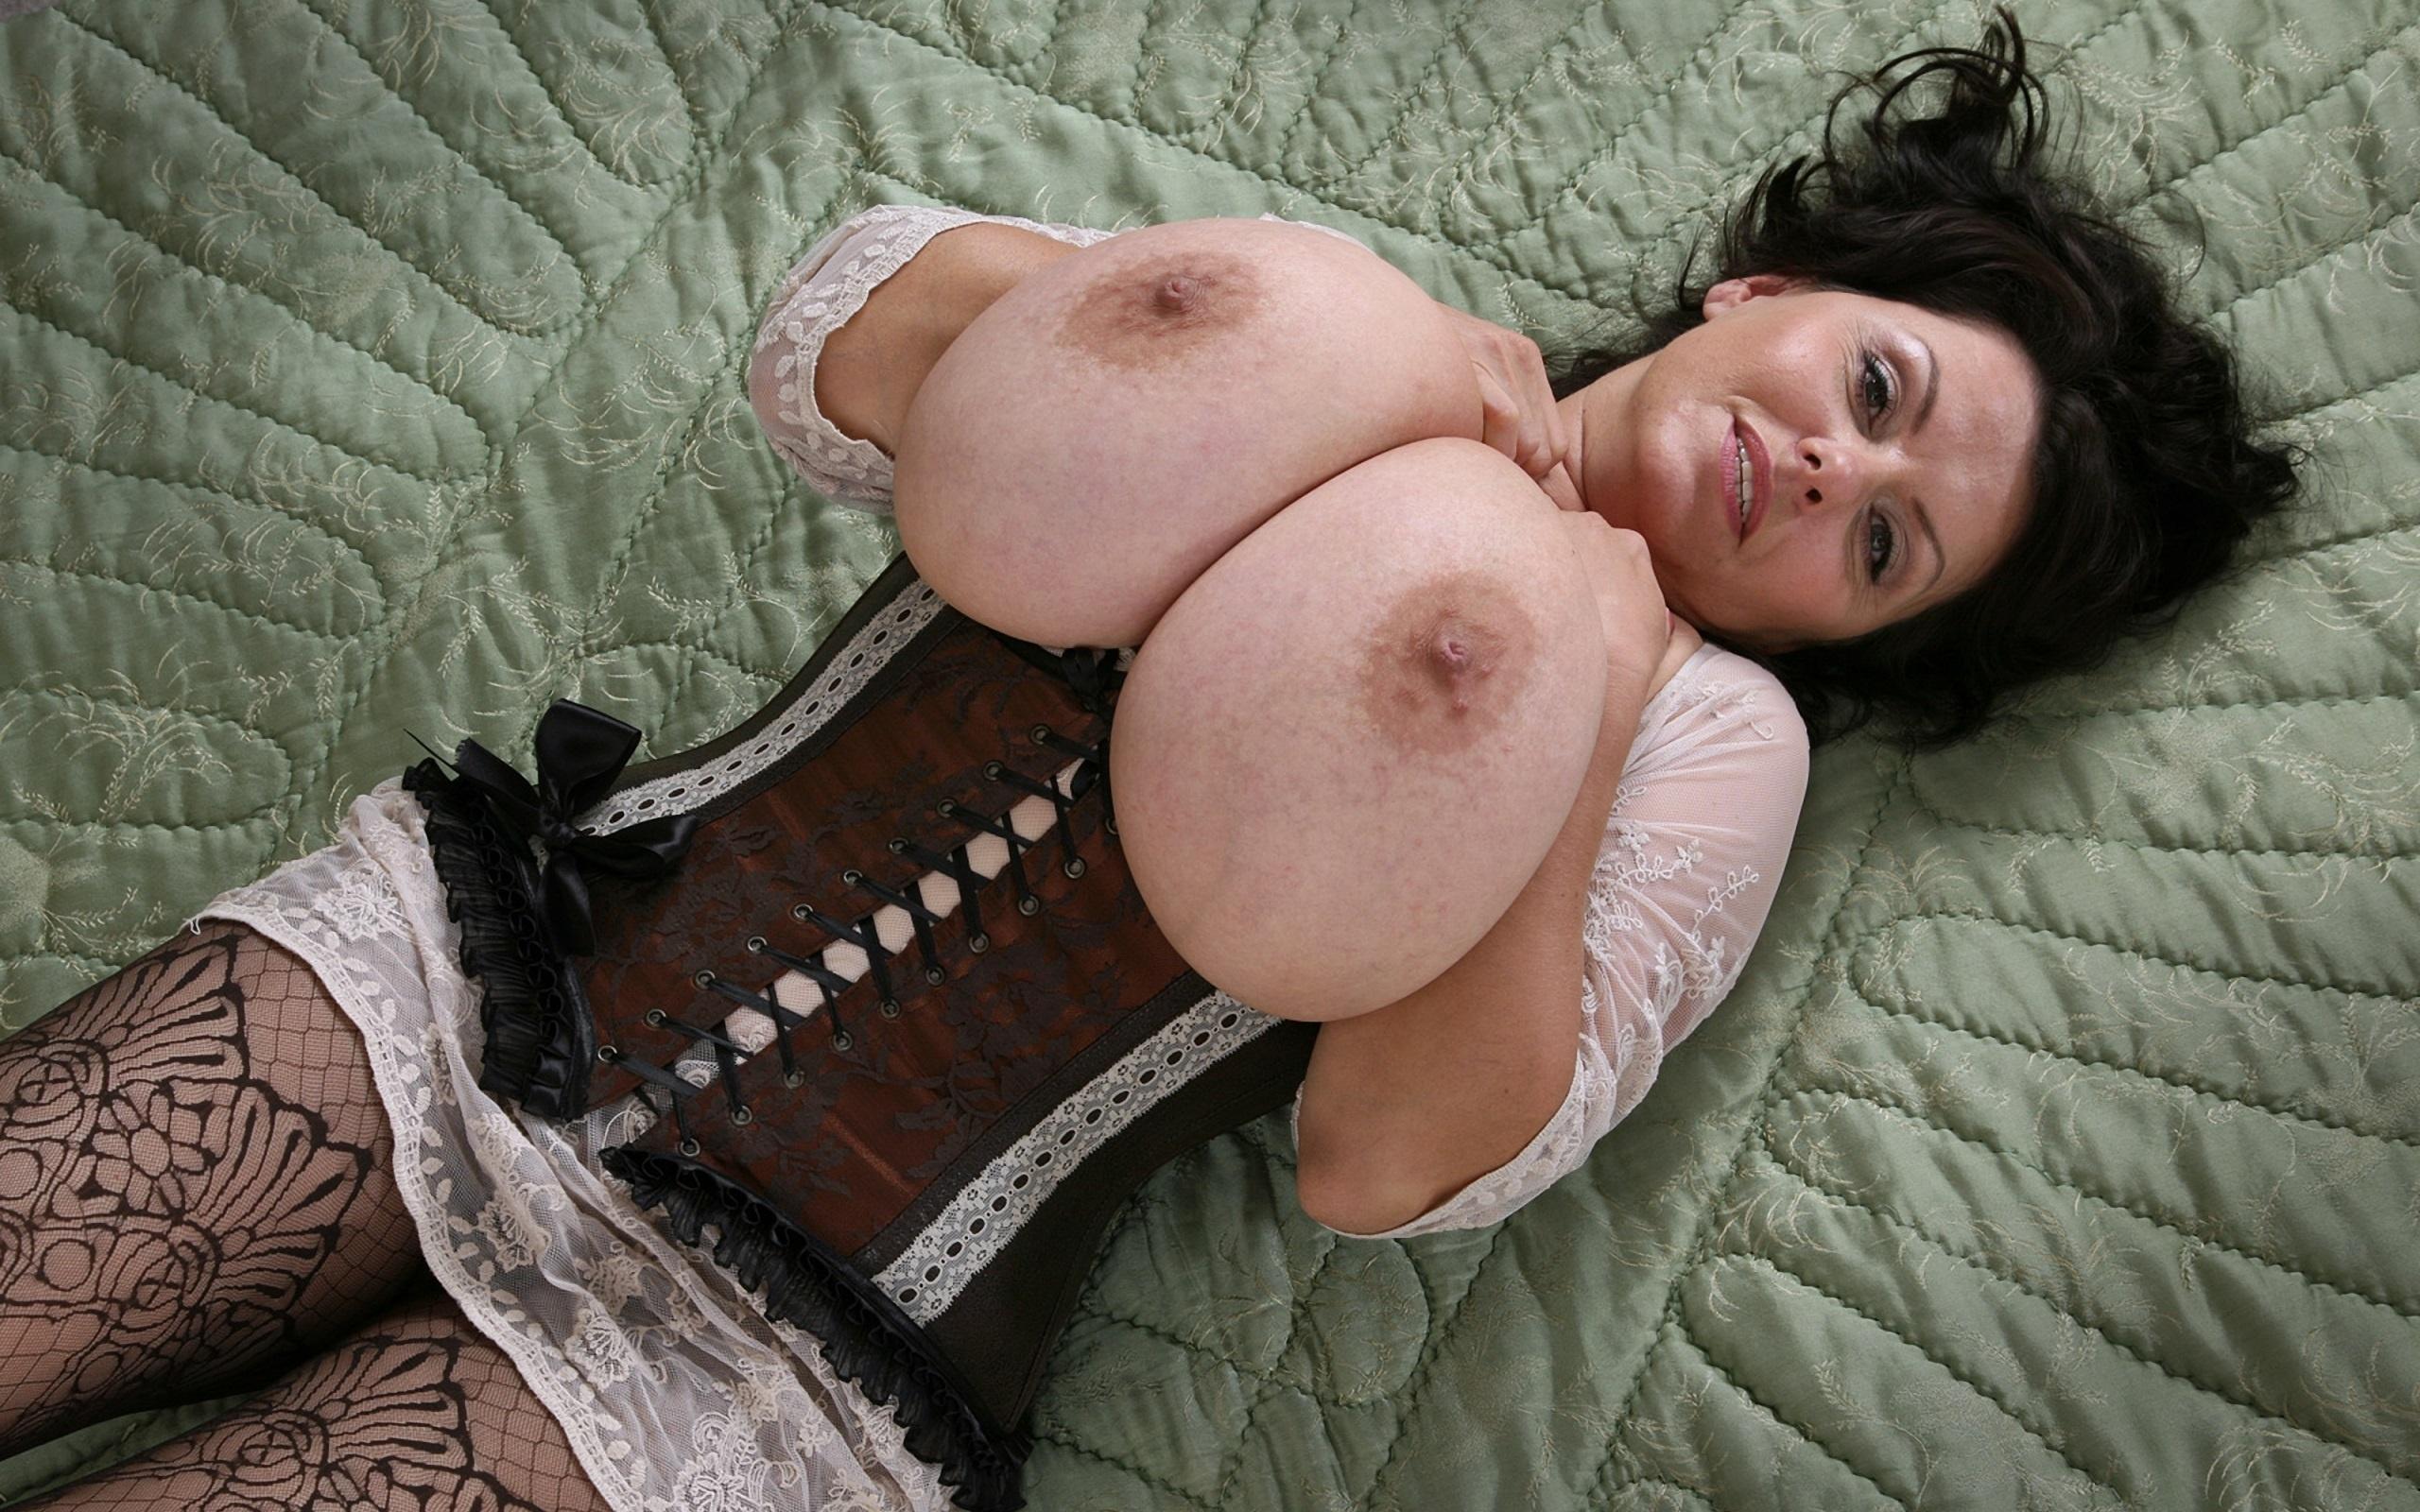 Amazing Big Tits Natural Babe Big Tits Babe Panty Big Tits Amazing